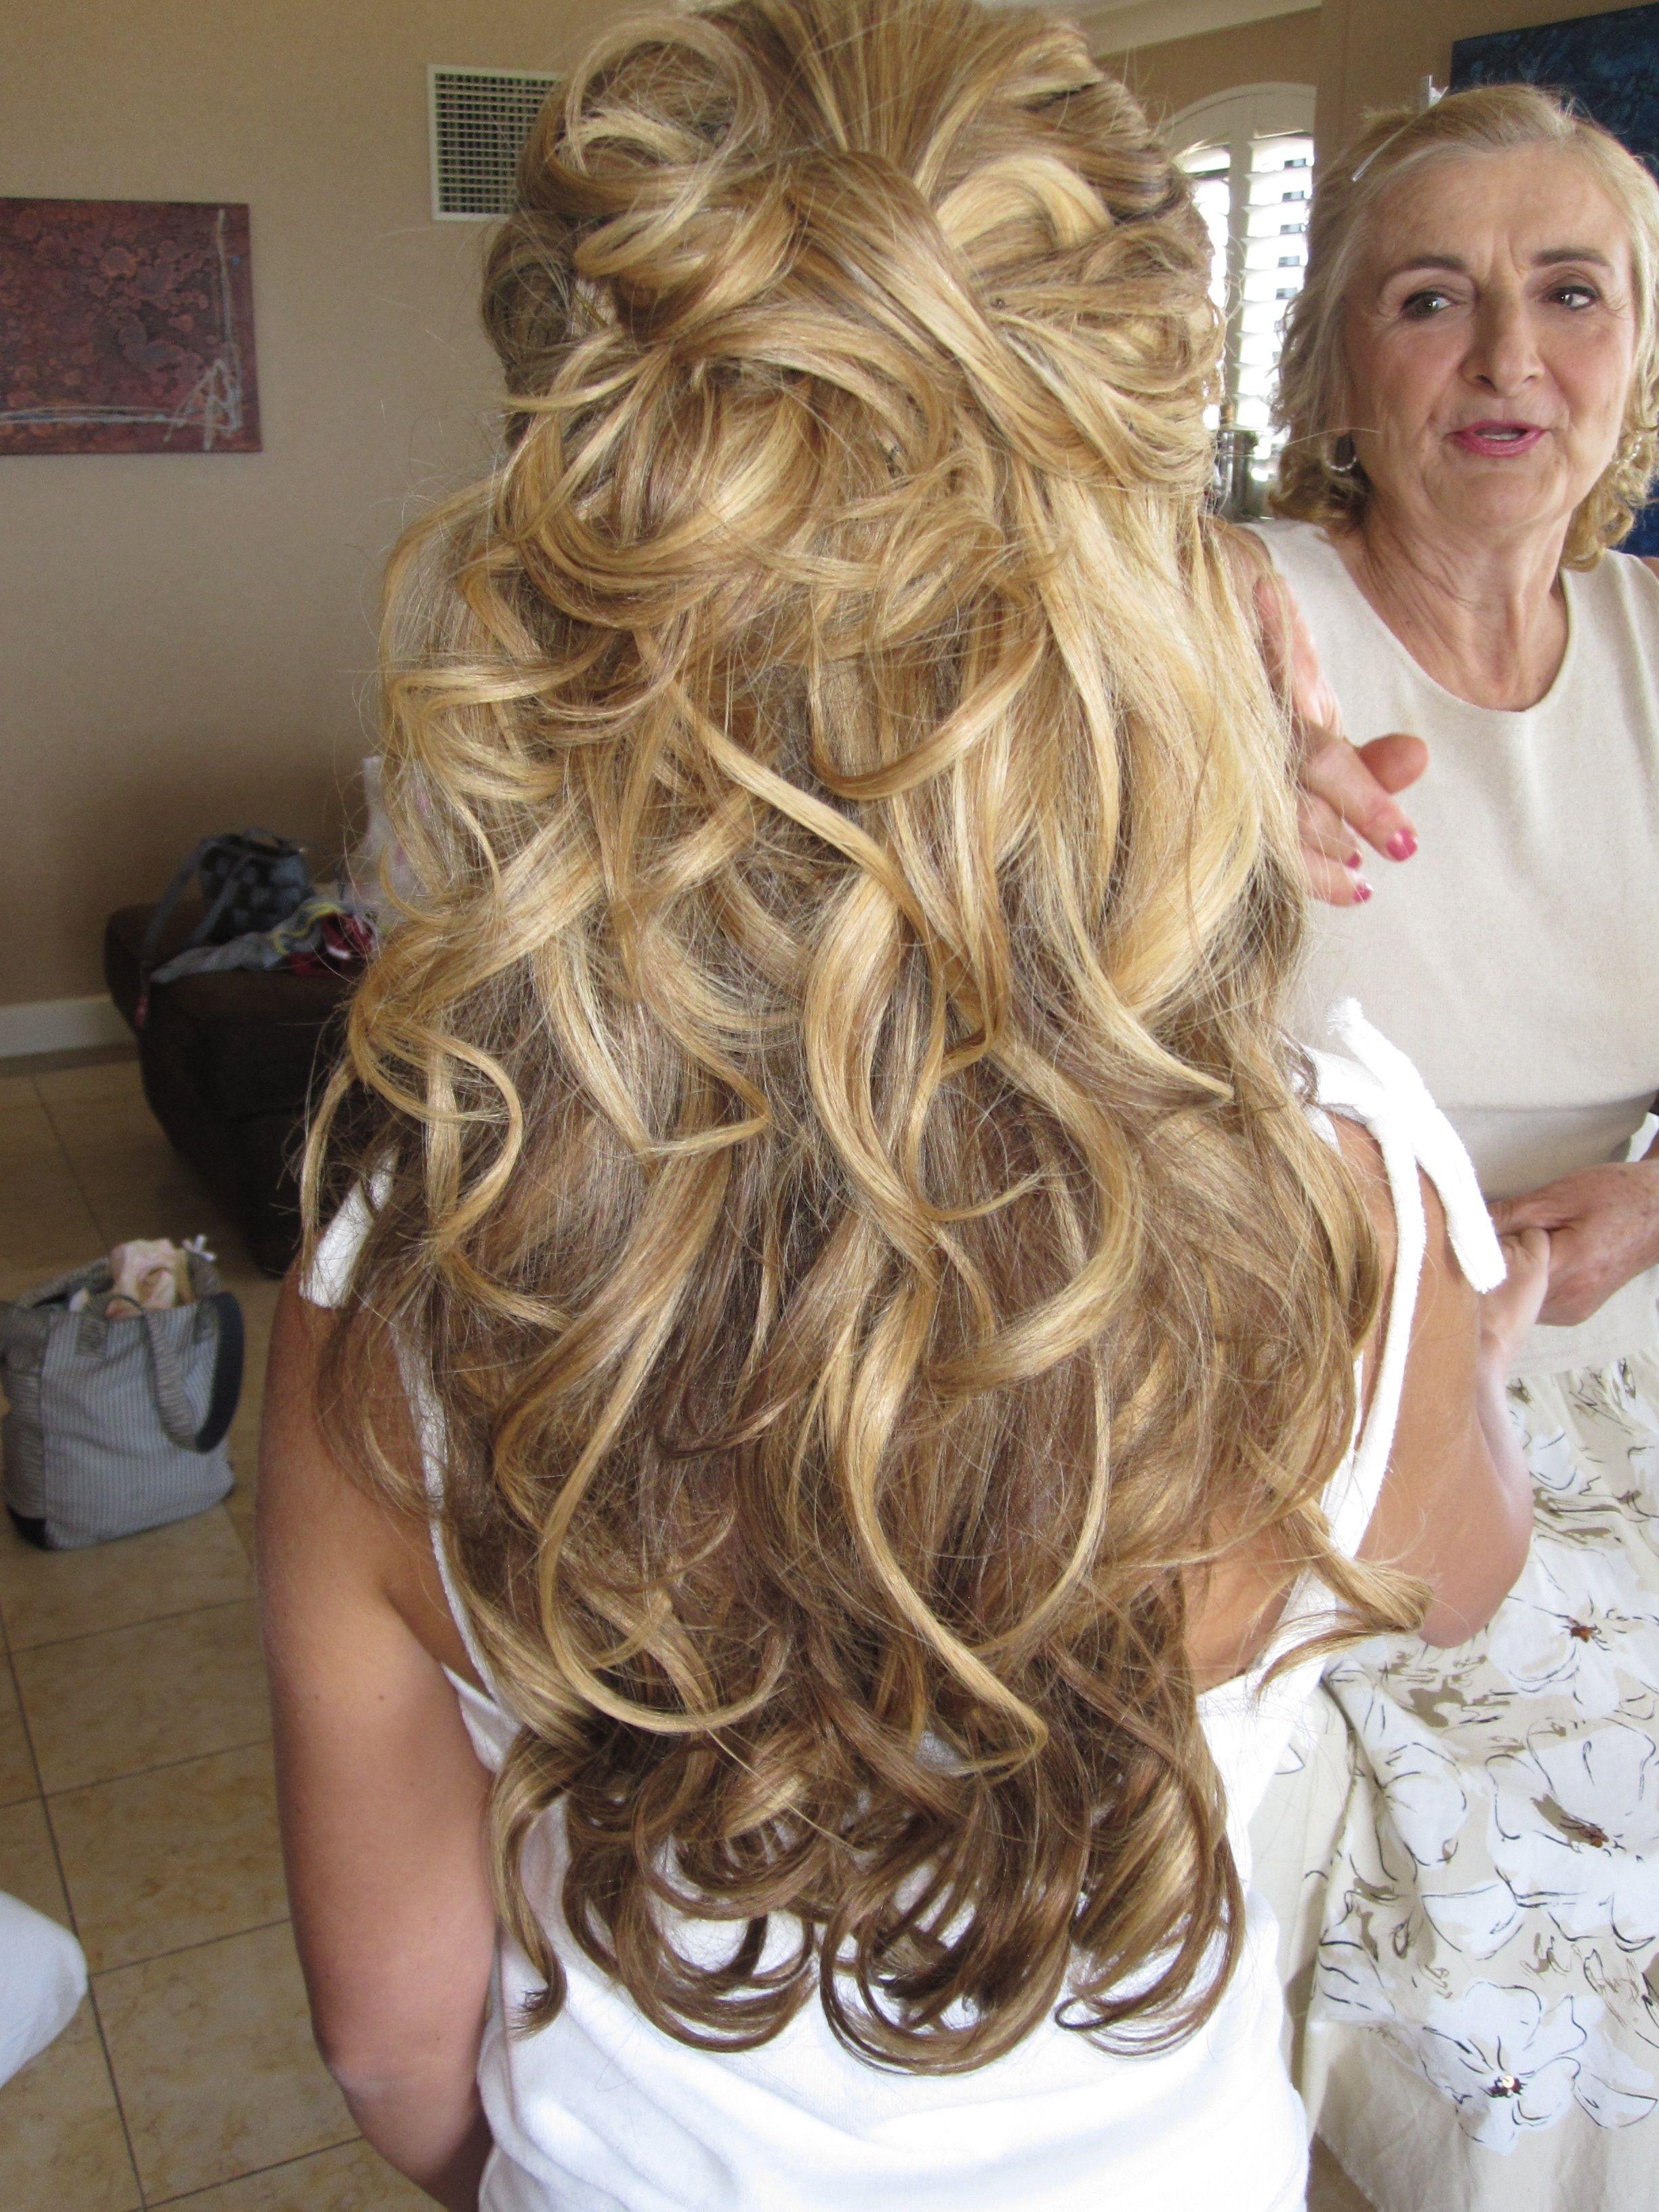 1 2 Up 1 2 Down By Flawlessfacesinc Com Bride Bridal Hair 1 2 Up